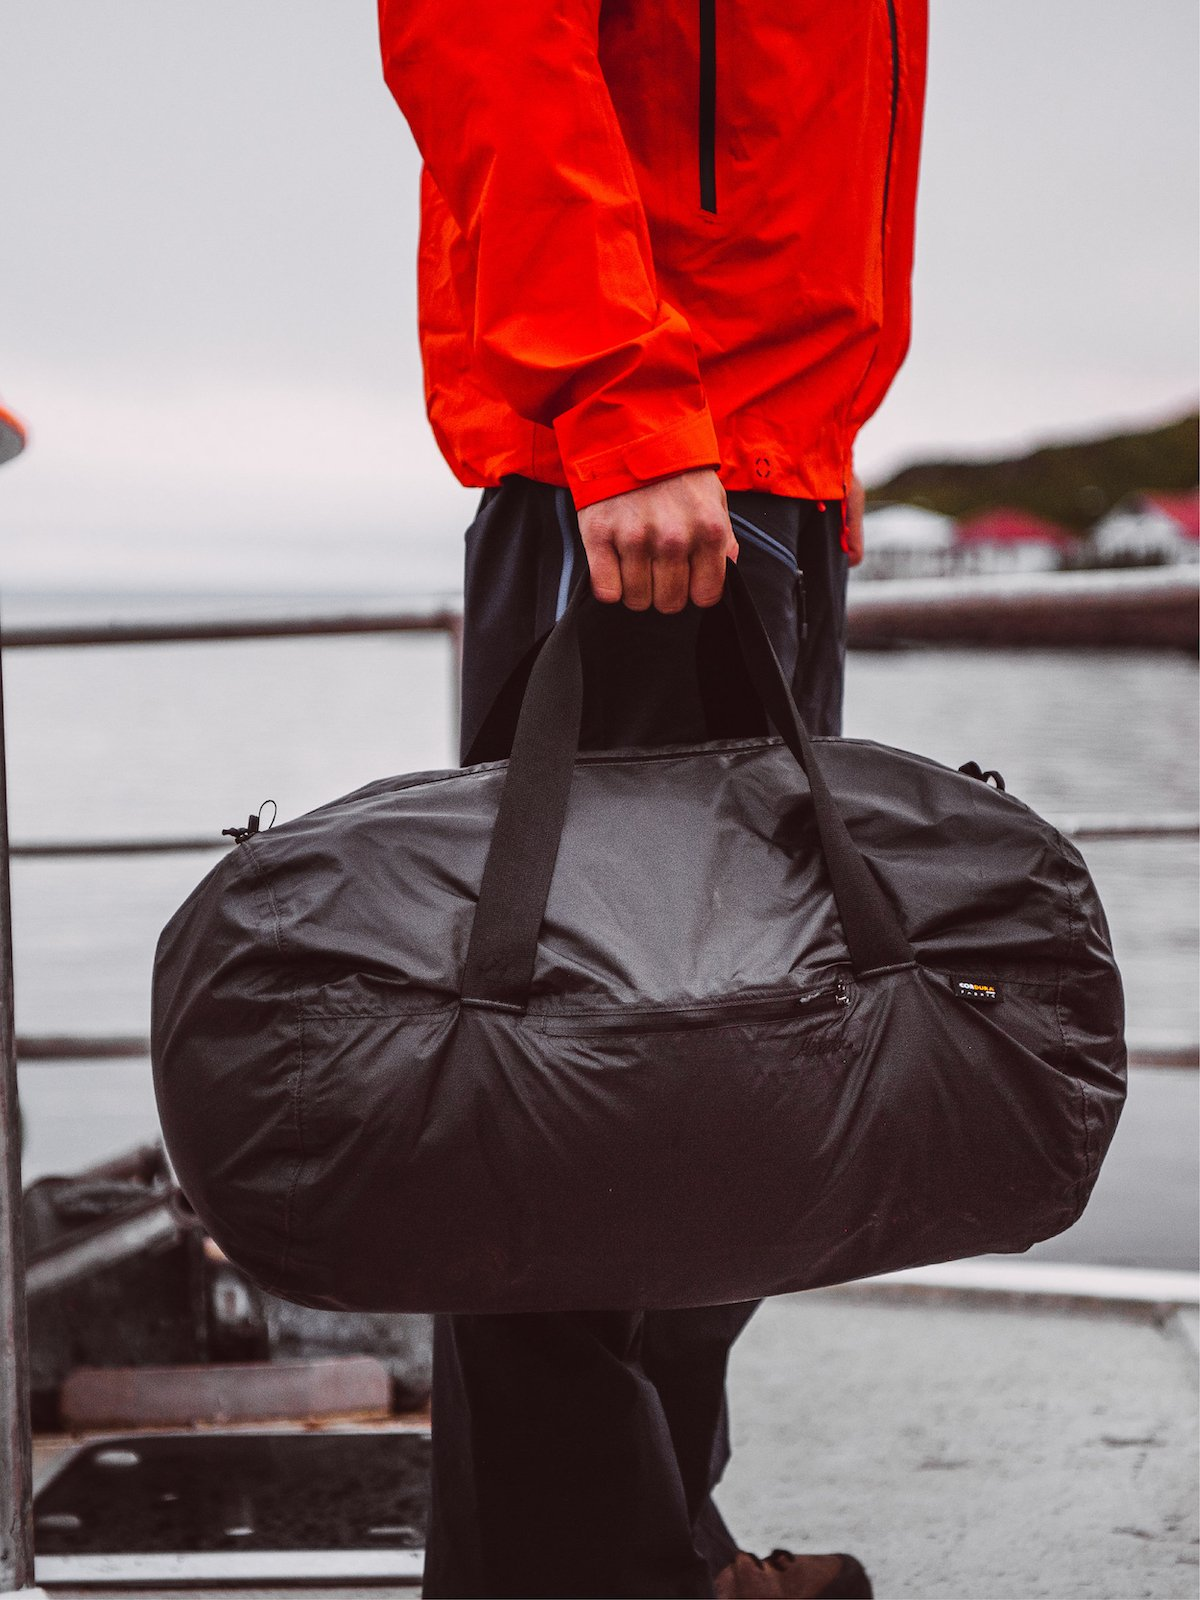 Matador-Transit30-2.0-Pocket-Duffle-Bag-Charcoal-Grey